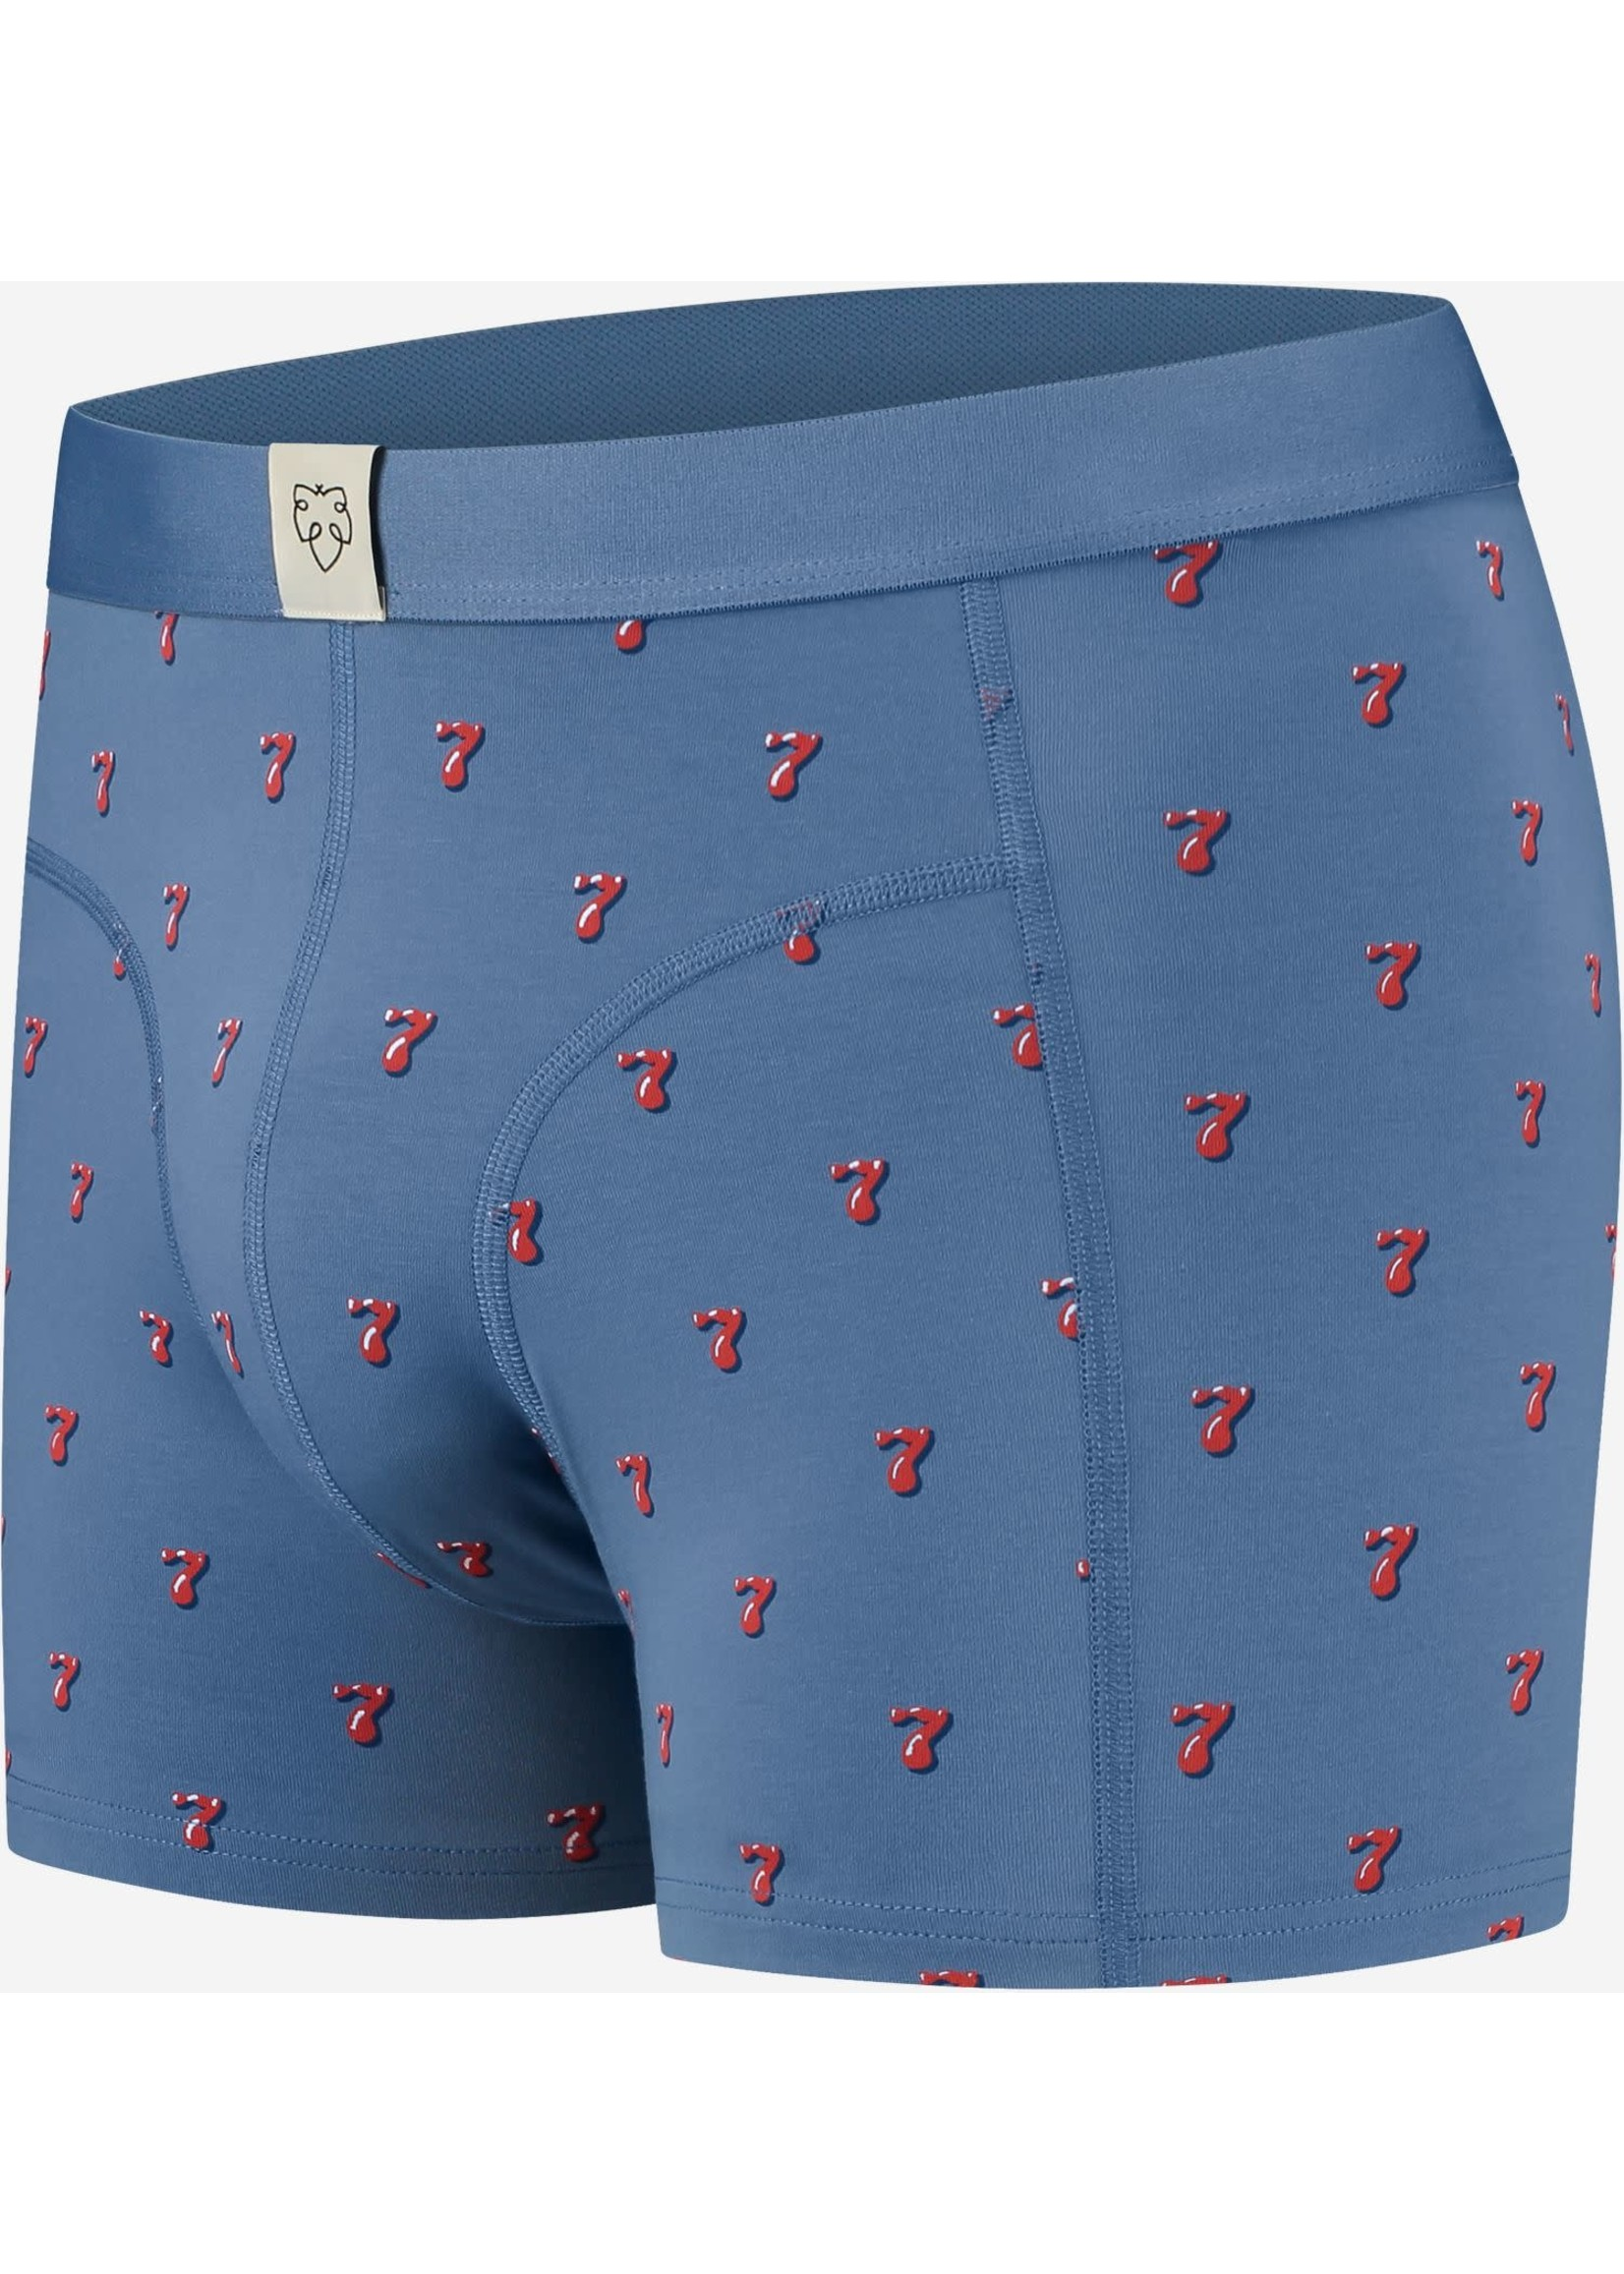 A-dam Underwear boxer Winne